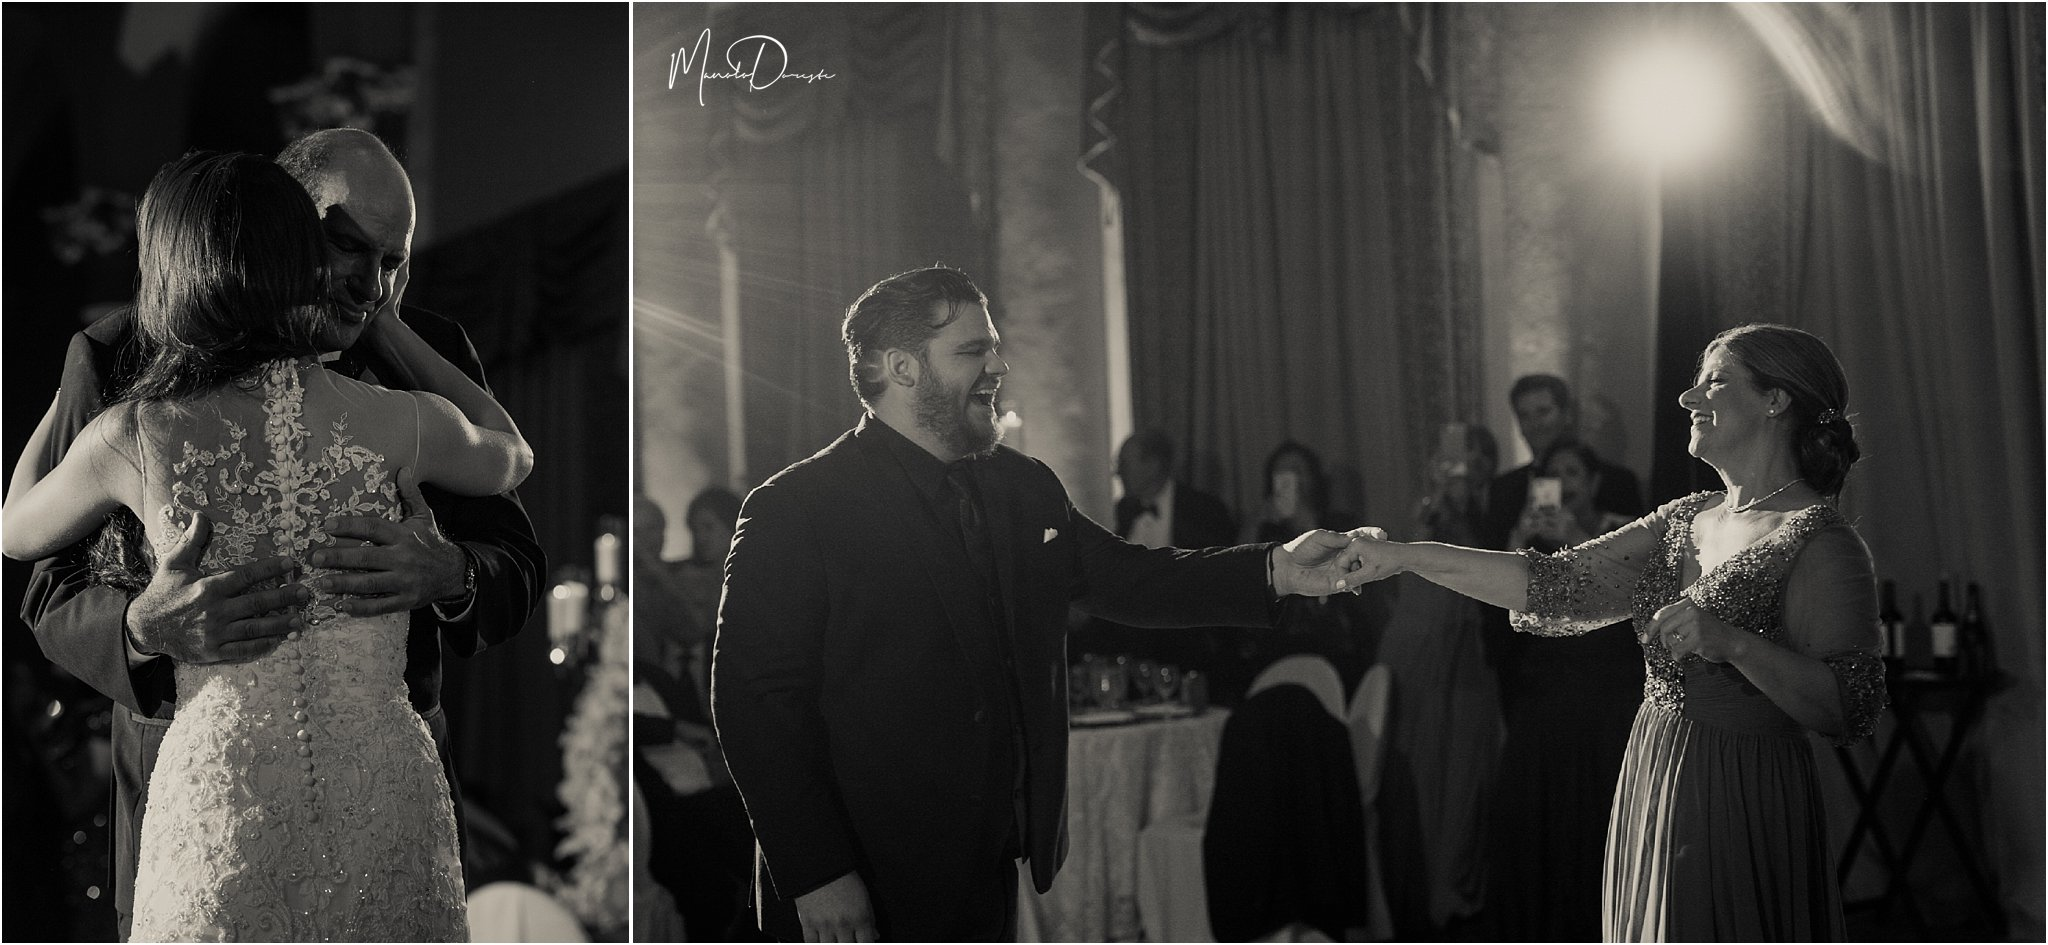 0170_ManoloDoreste_InFocusStudios_Wedding_Family_Photography_Miami_MiamiPhotographer.jpg